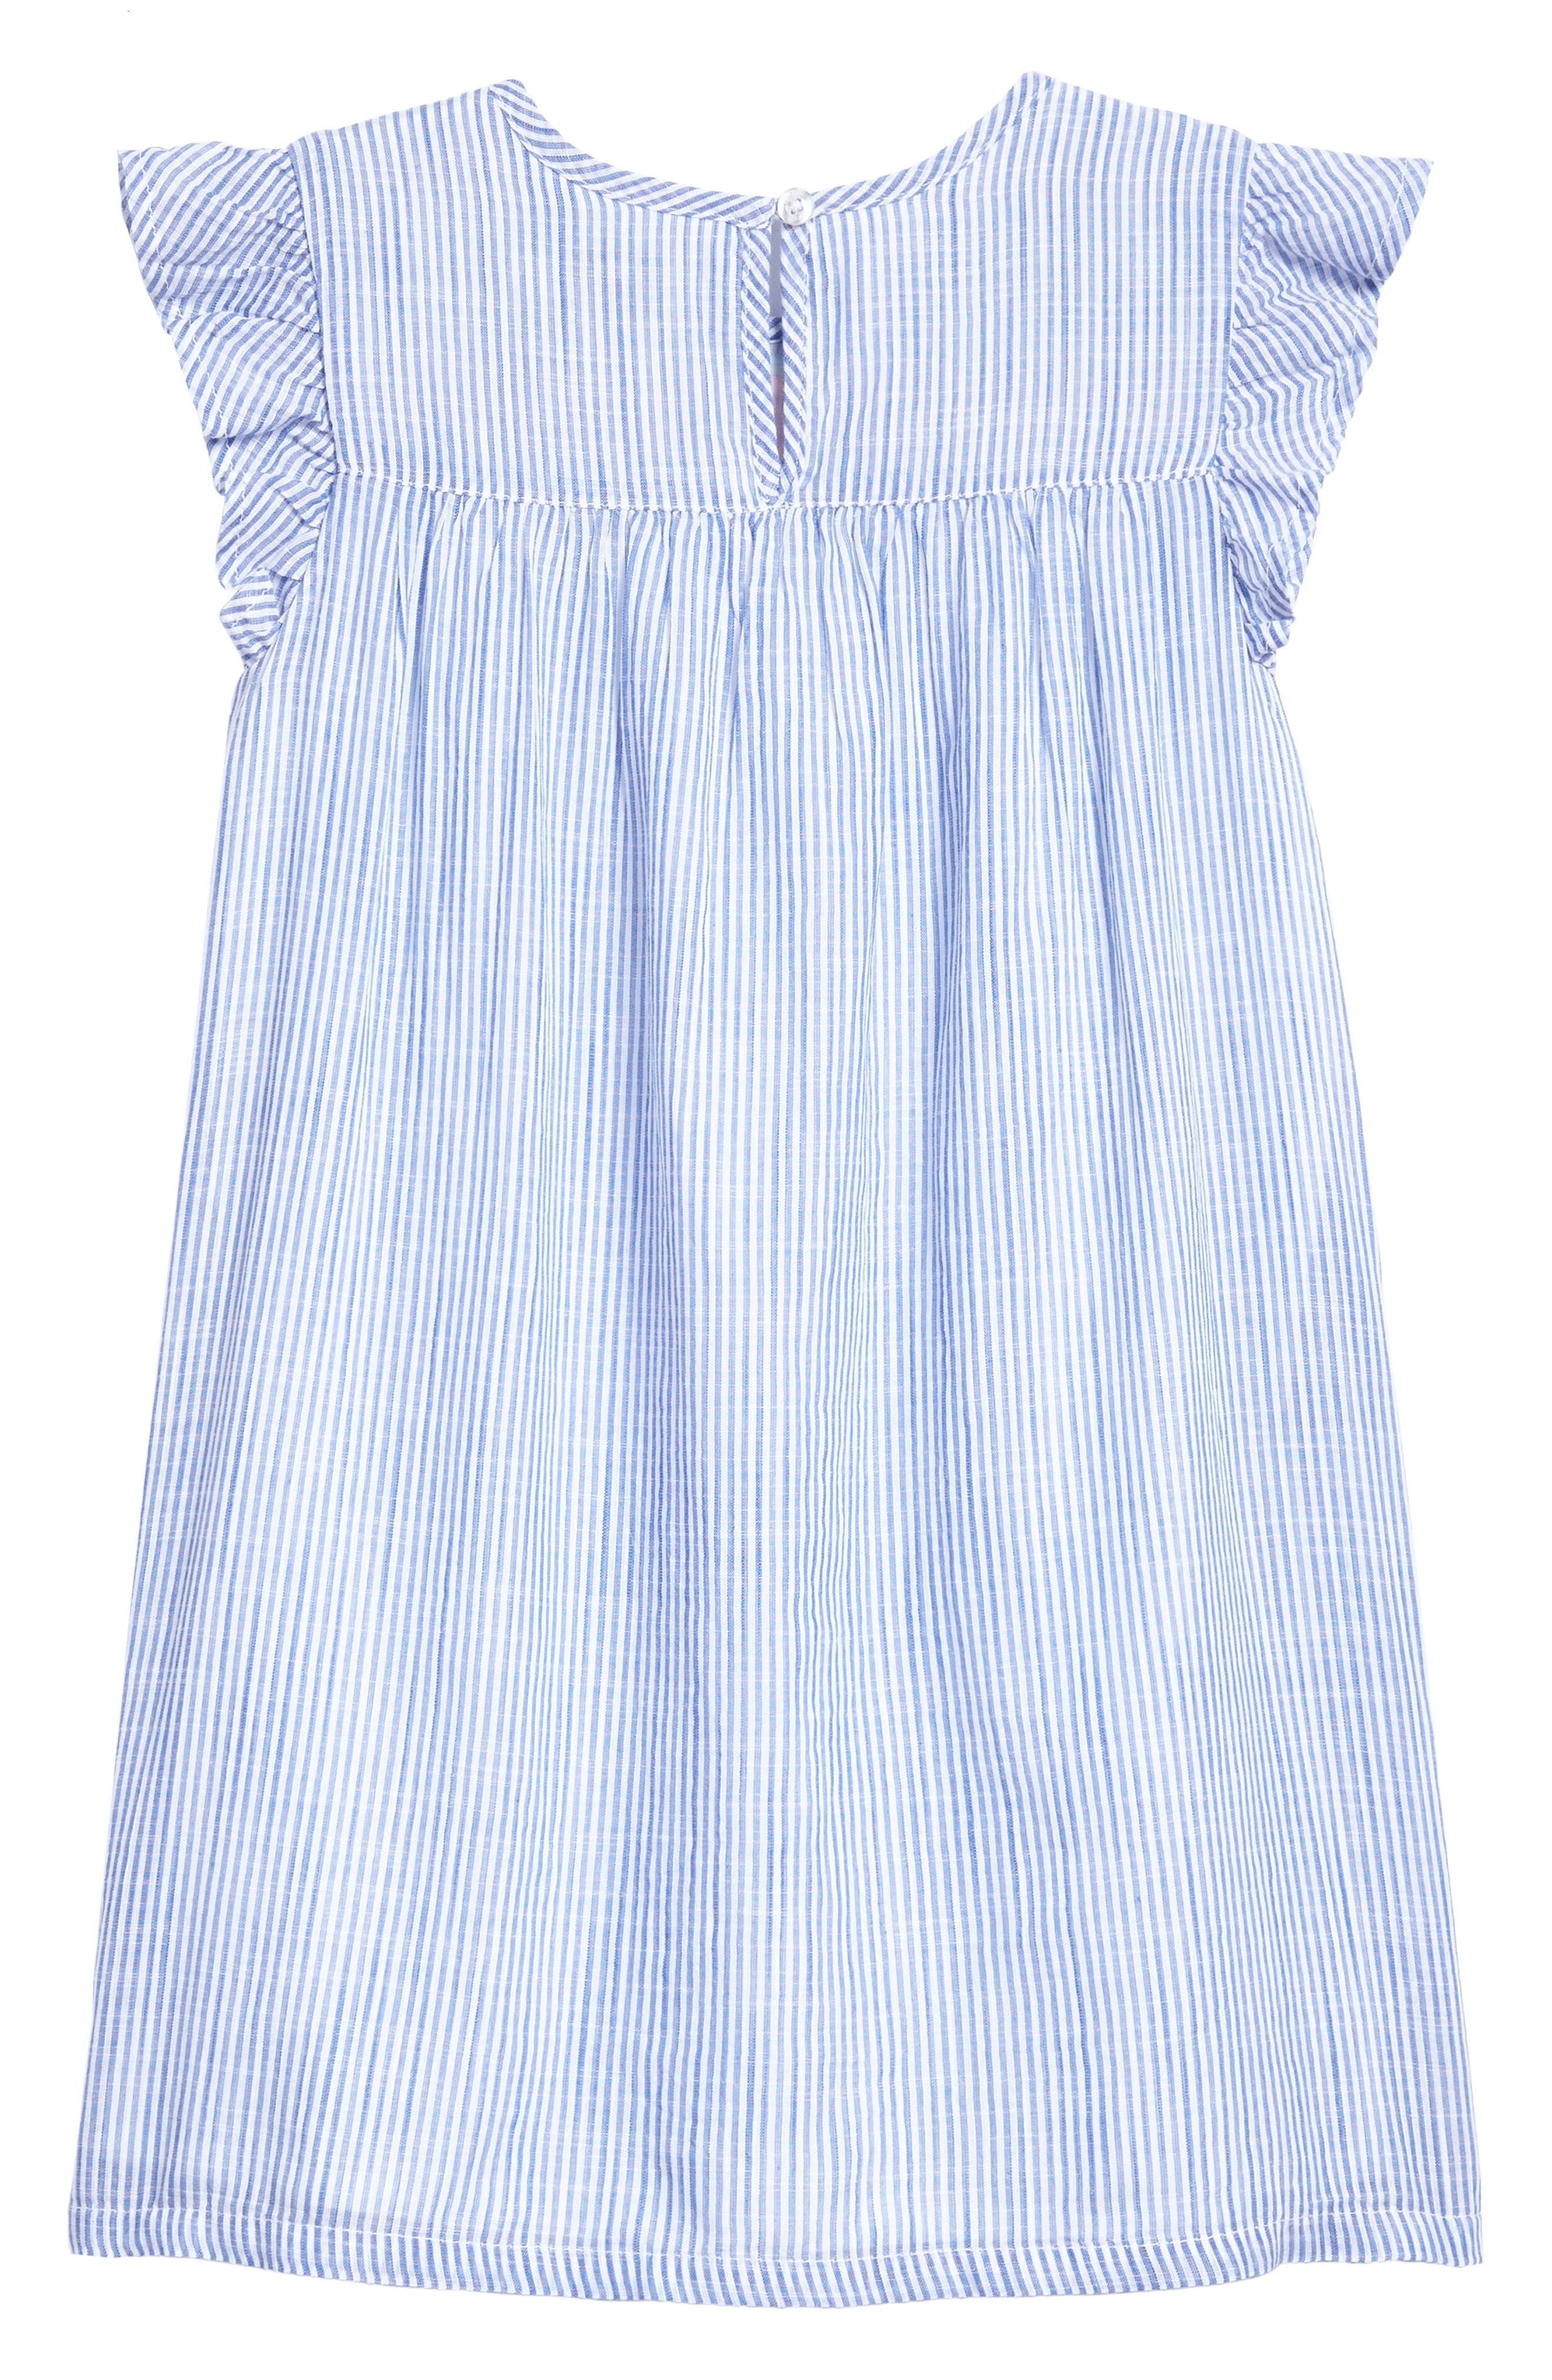 Embroidered Flutter Dress,                             Alternate thumbnail 2, color,                             400